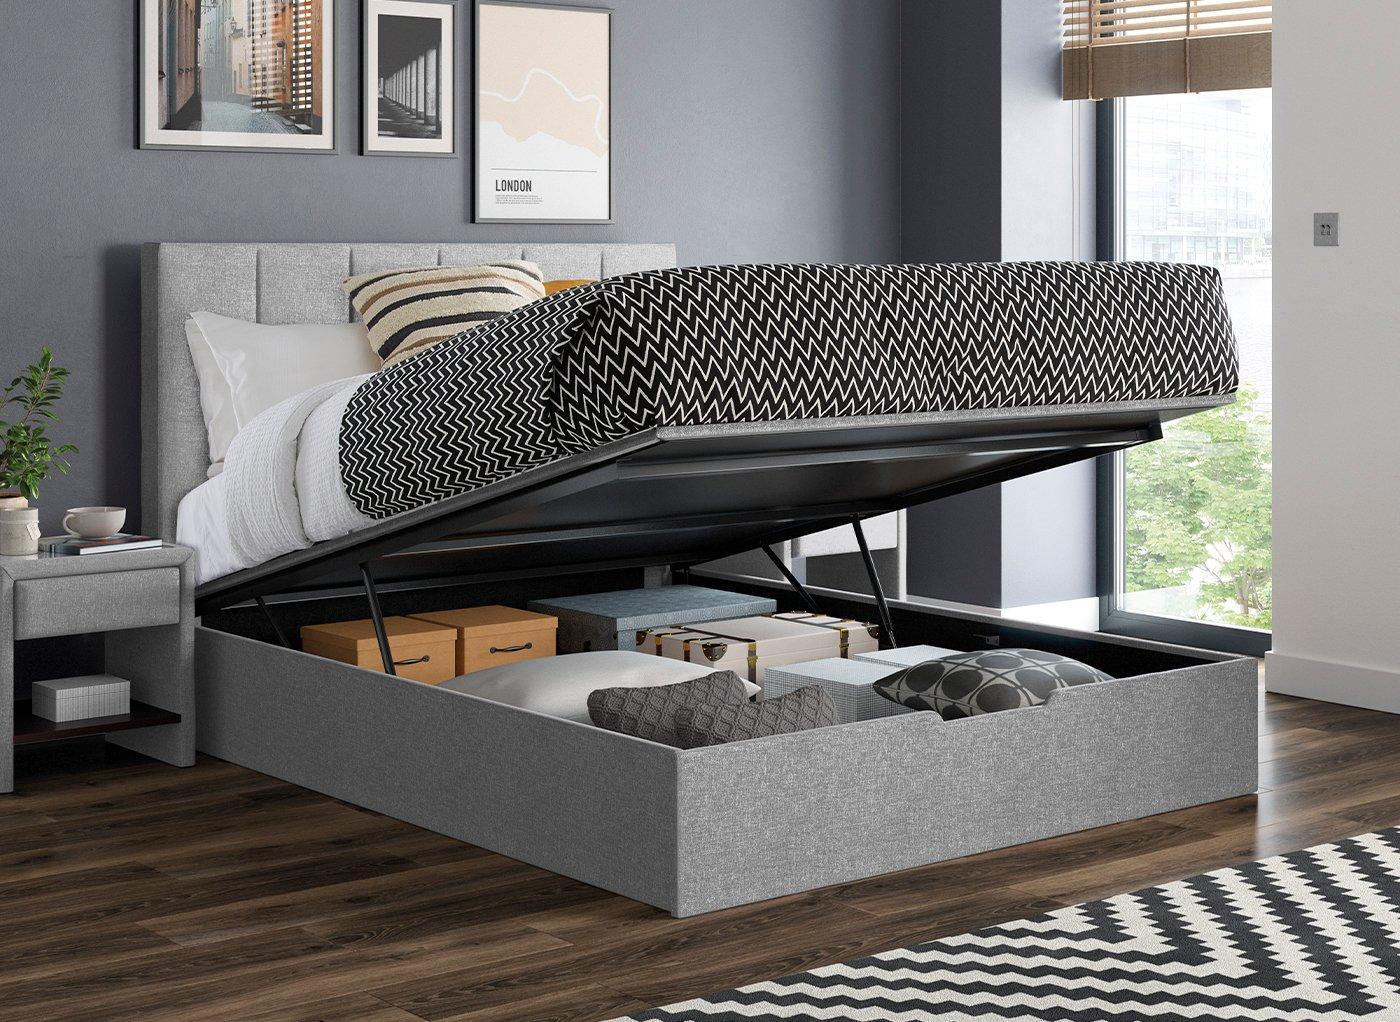 ealing-upholstered-ottoman-bed-frame